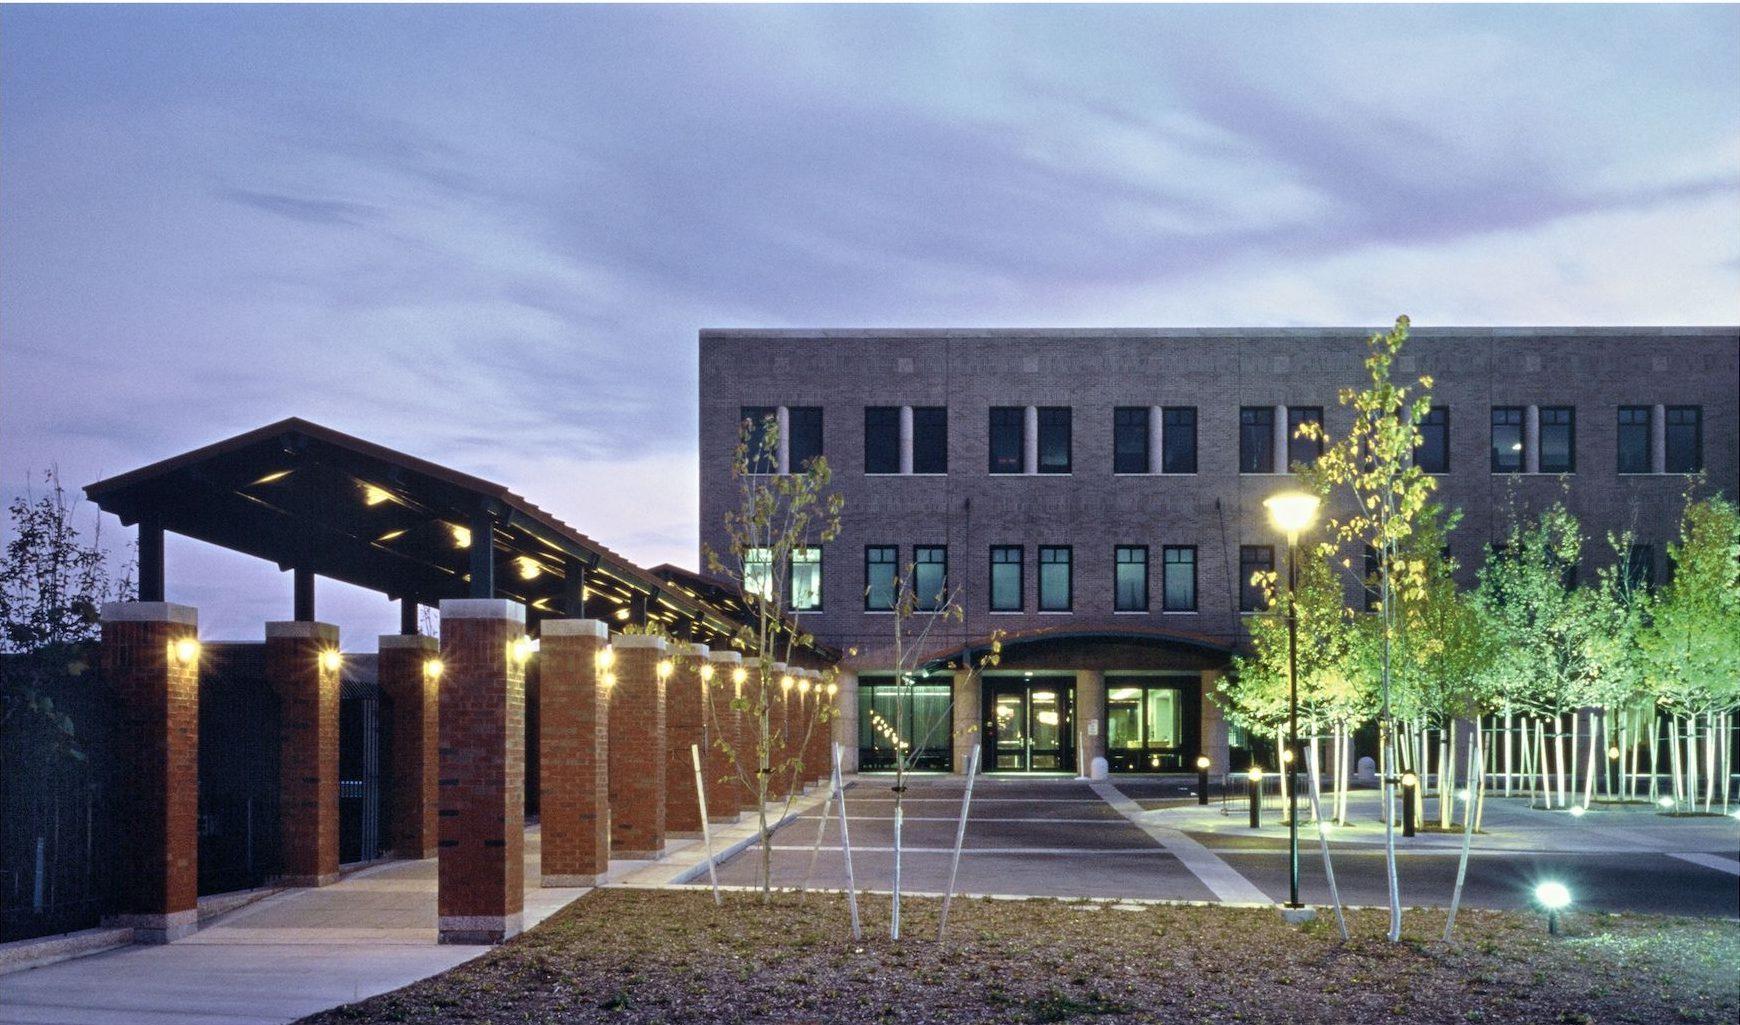 Rochester Psychiatric Center Walkway